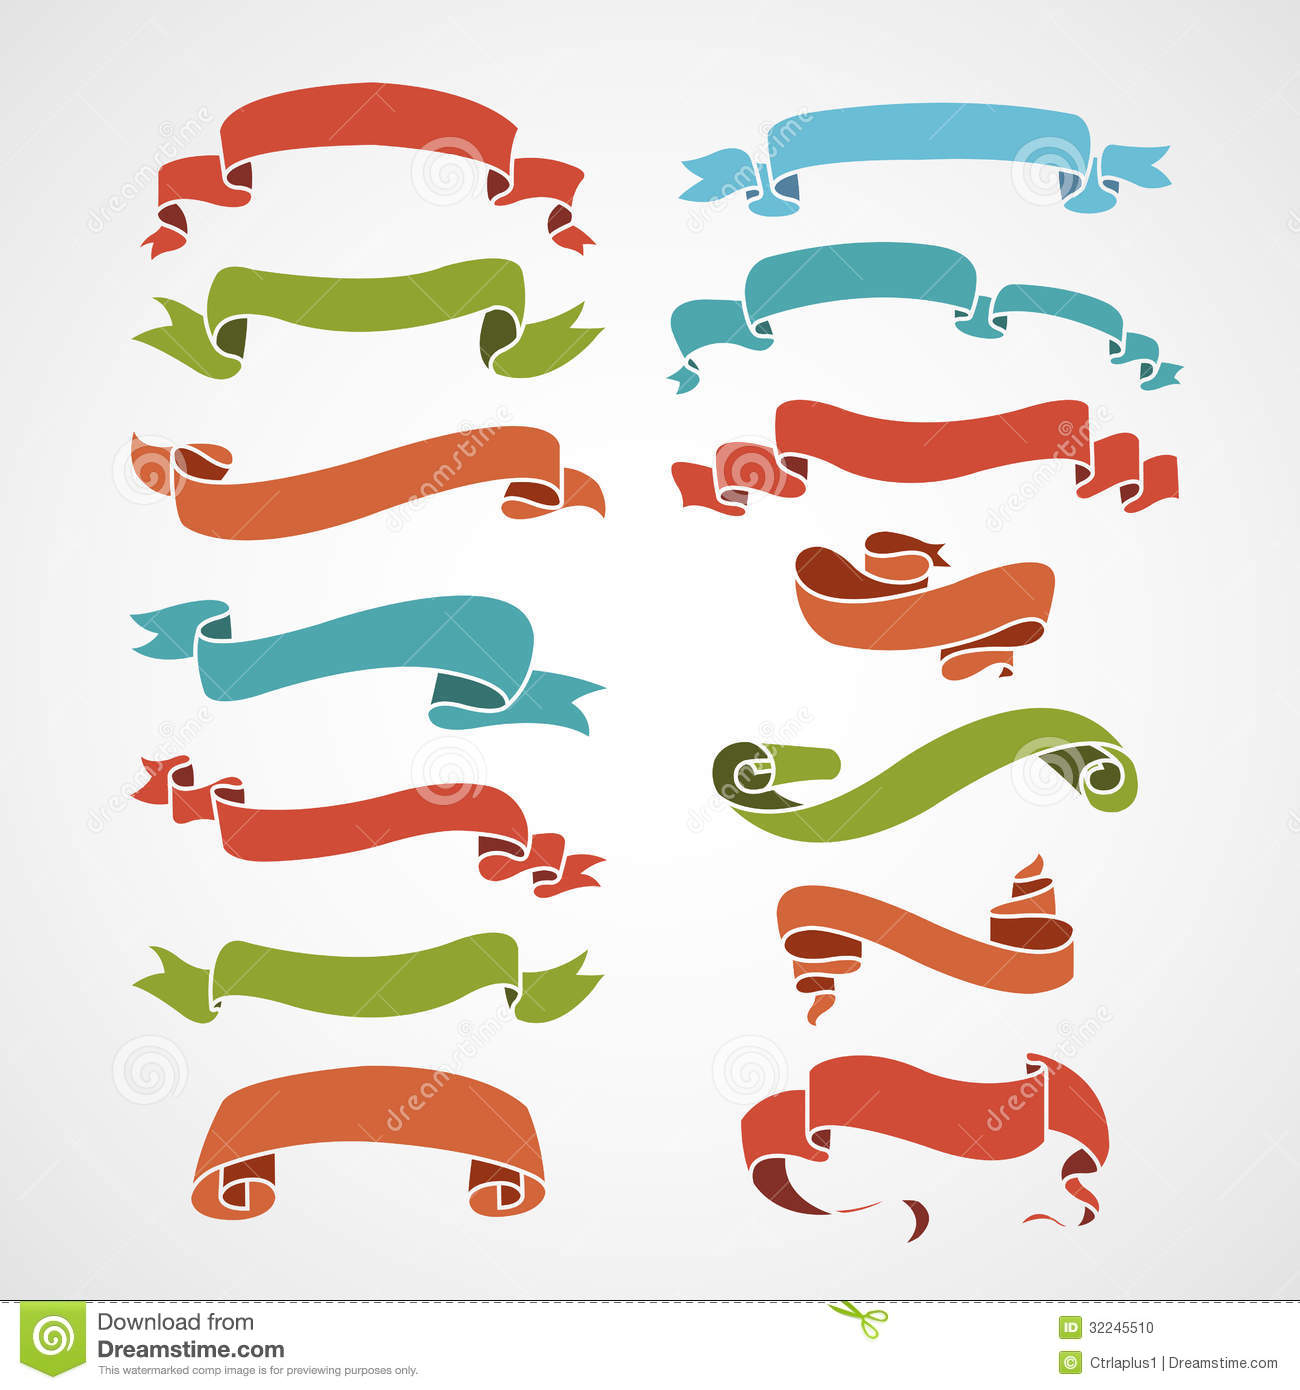 Vintage ribbon logo clipart png royalty free Full Color Set Of Vintage Ribbons Stock Photo - Image: 32245510 png royalty free